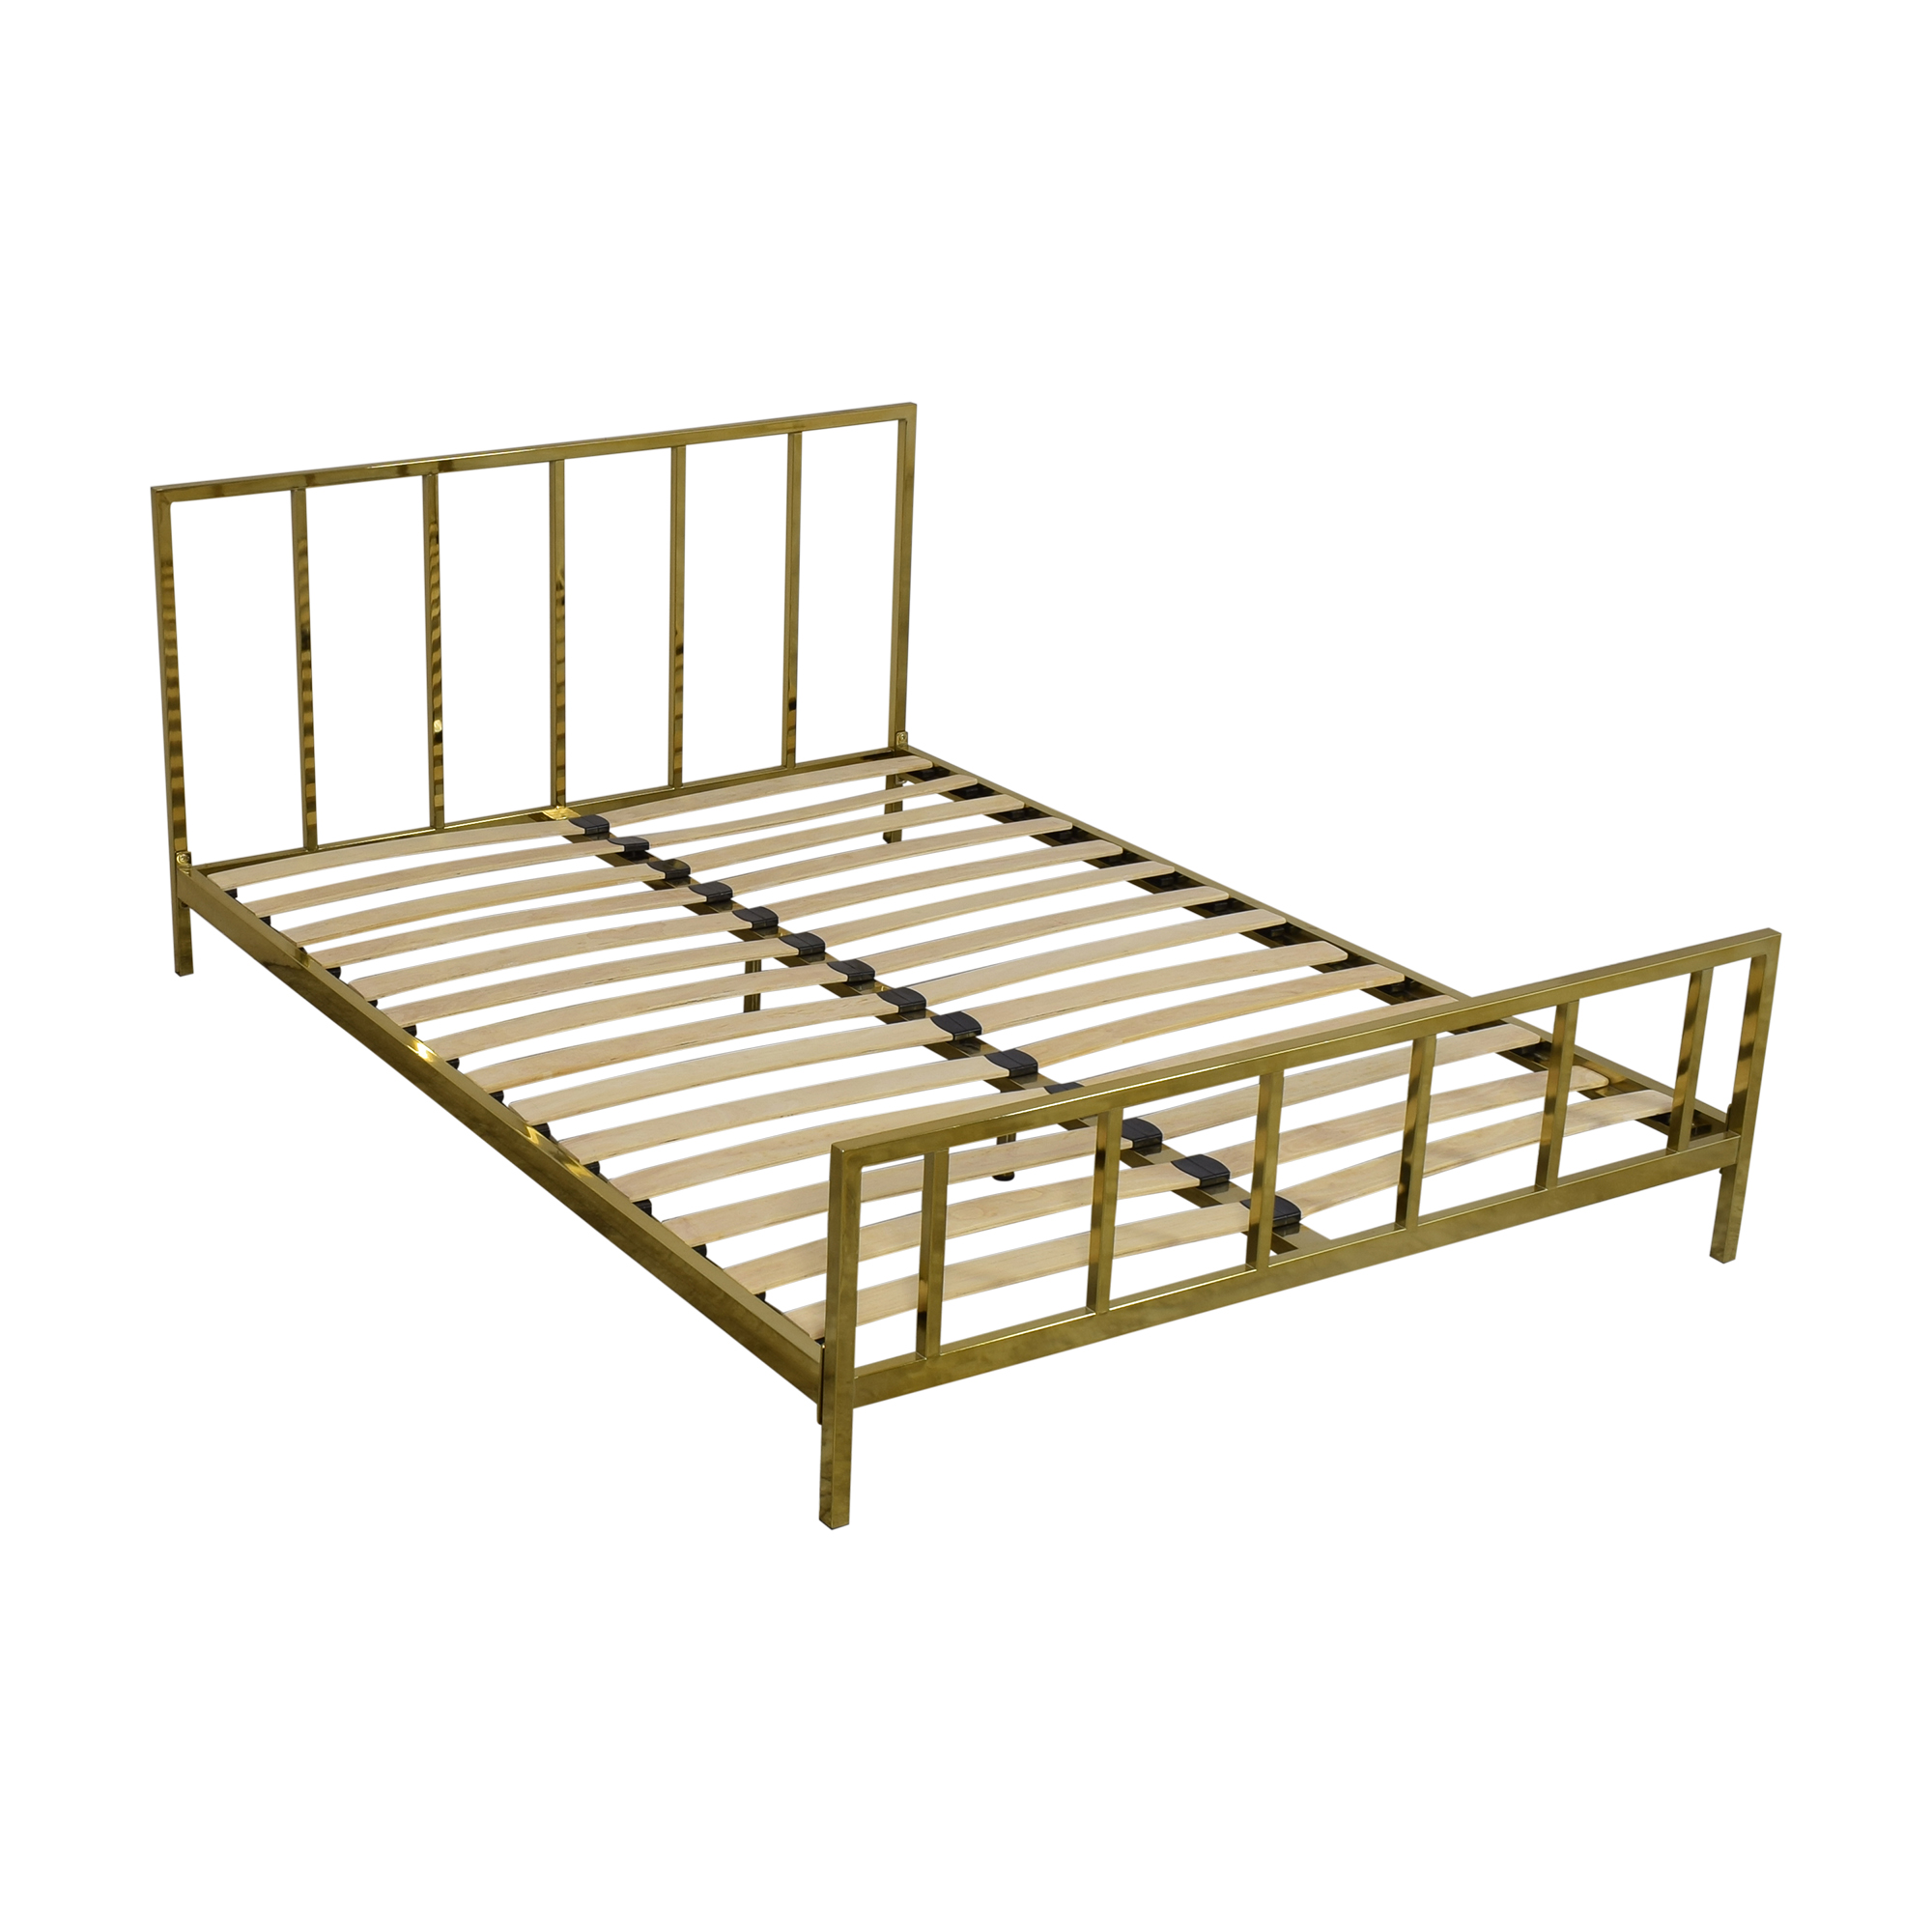 CB2 CB2 Alchemy Full Bronze Bed nyc